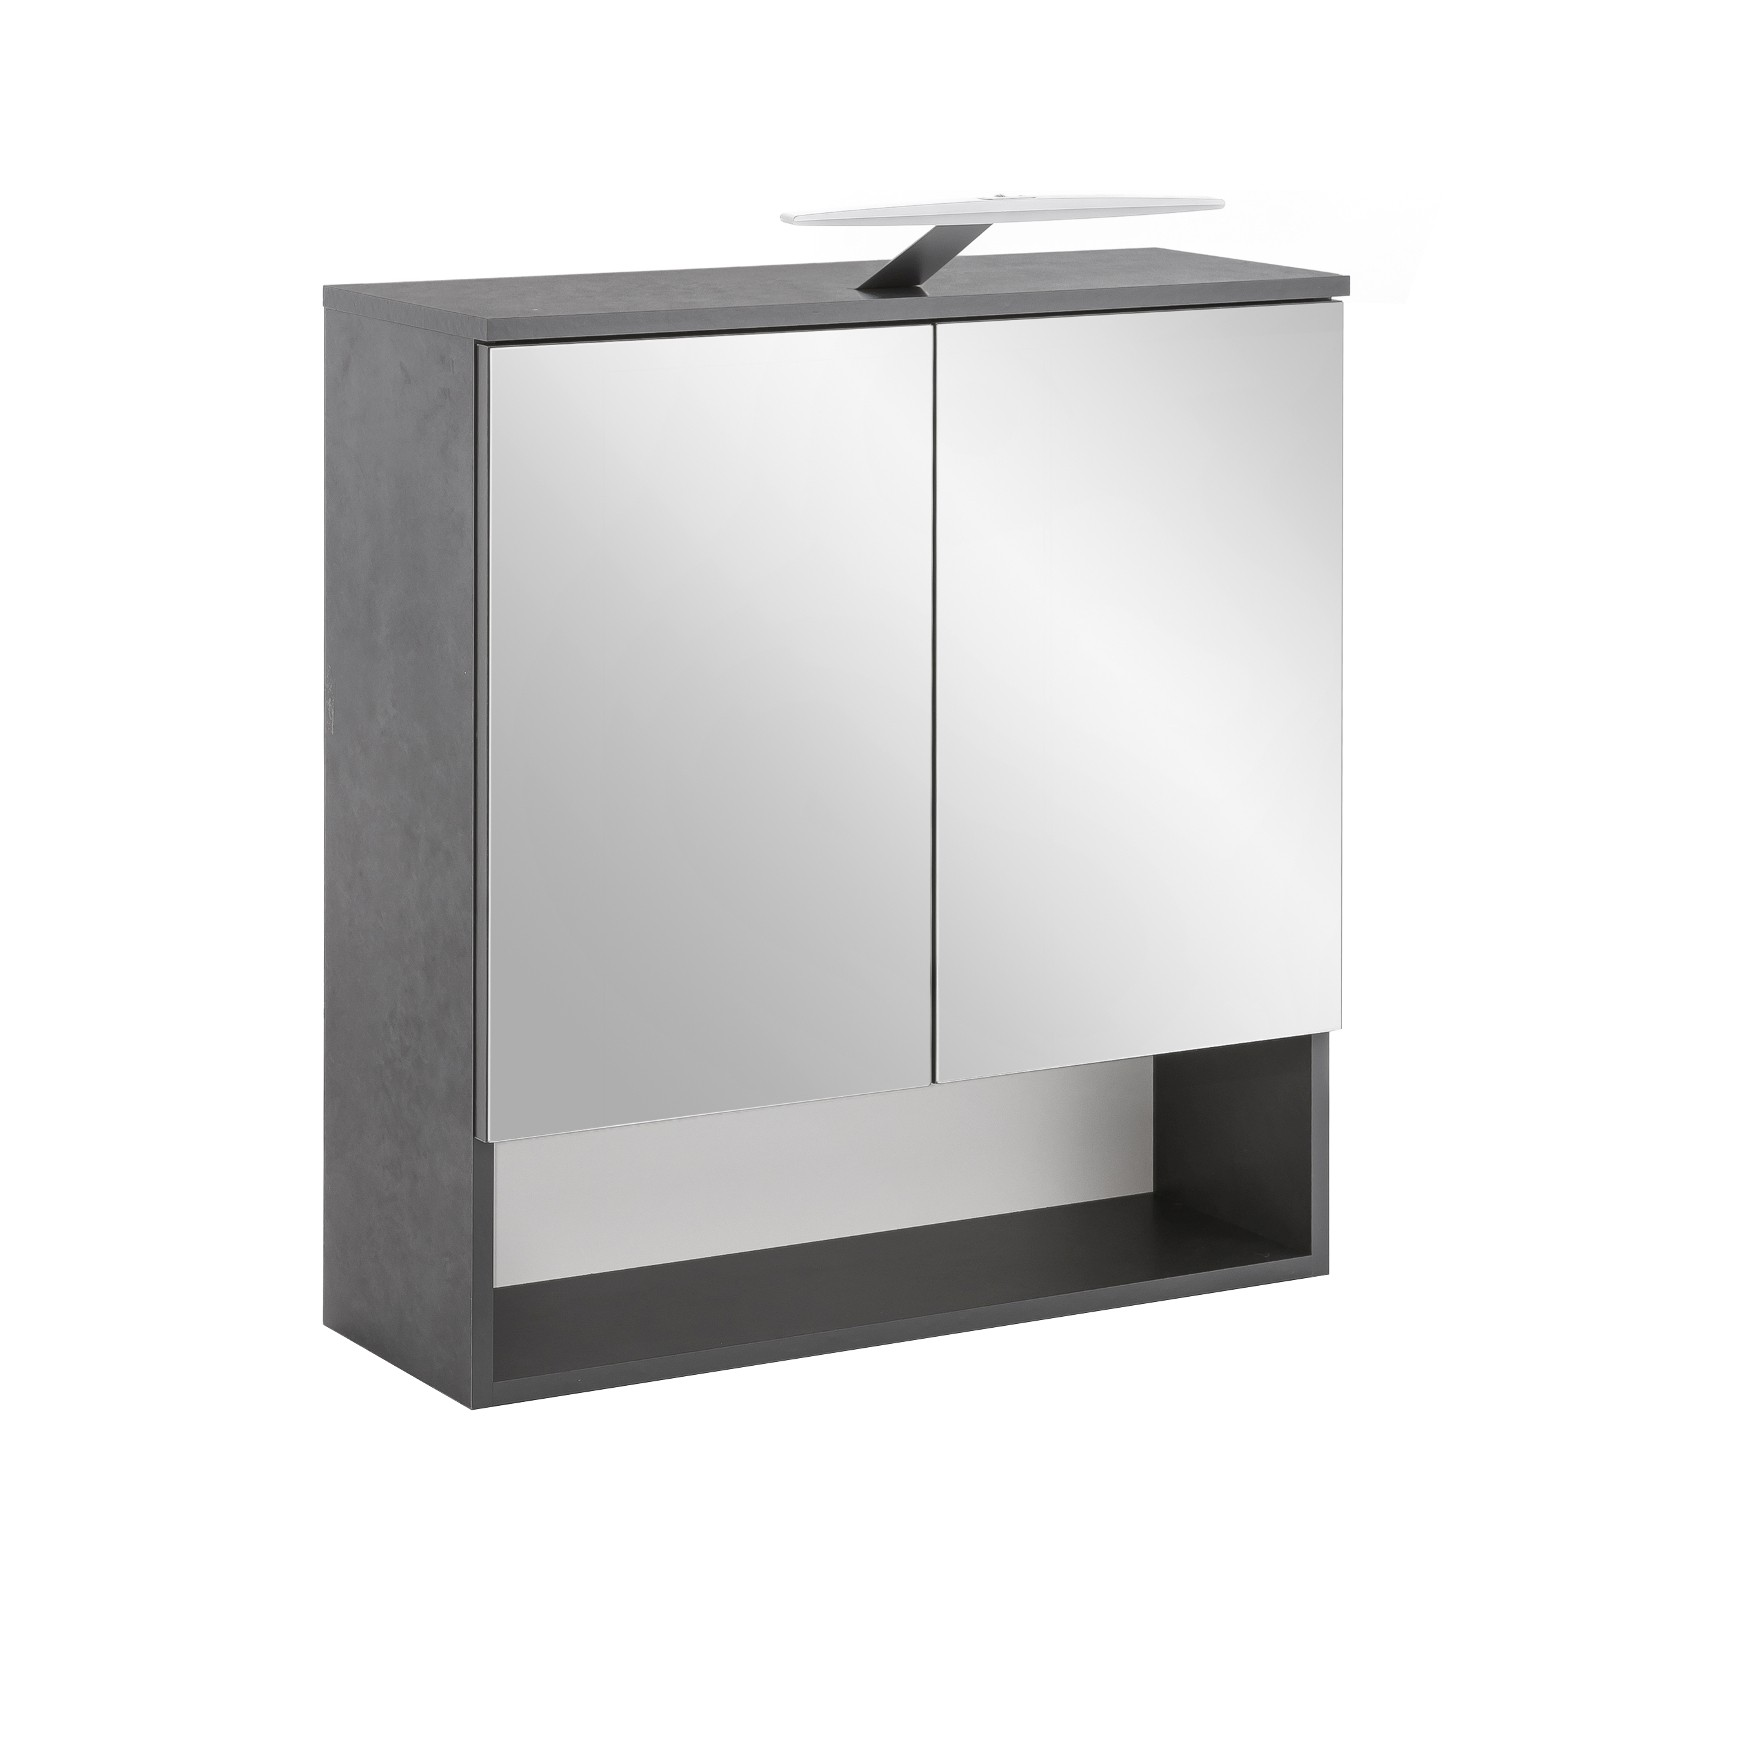 bad spiegelschrank 2 t rig mit led aufbauleuchte 65 cm. Black Bedroom Furniture Sets. Home Design Ideas